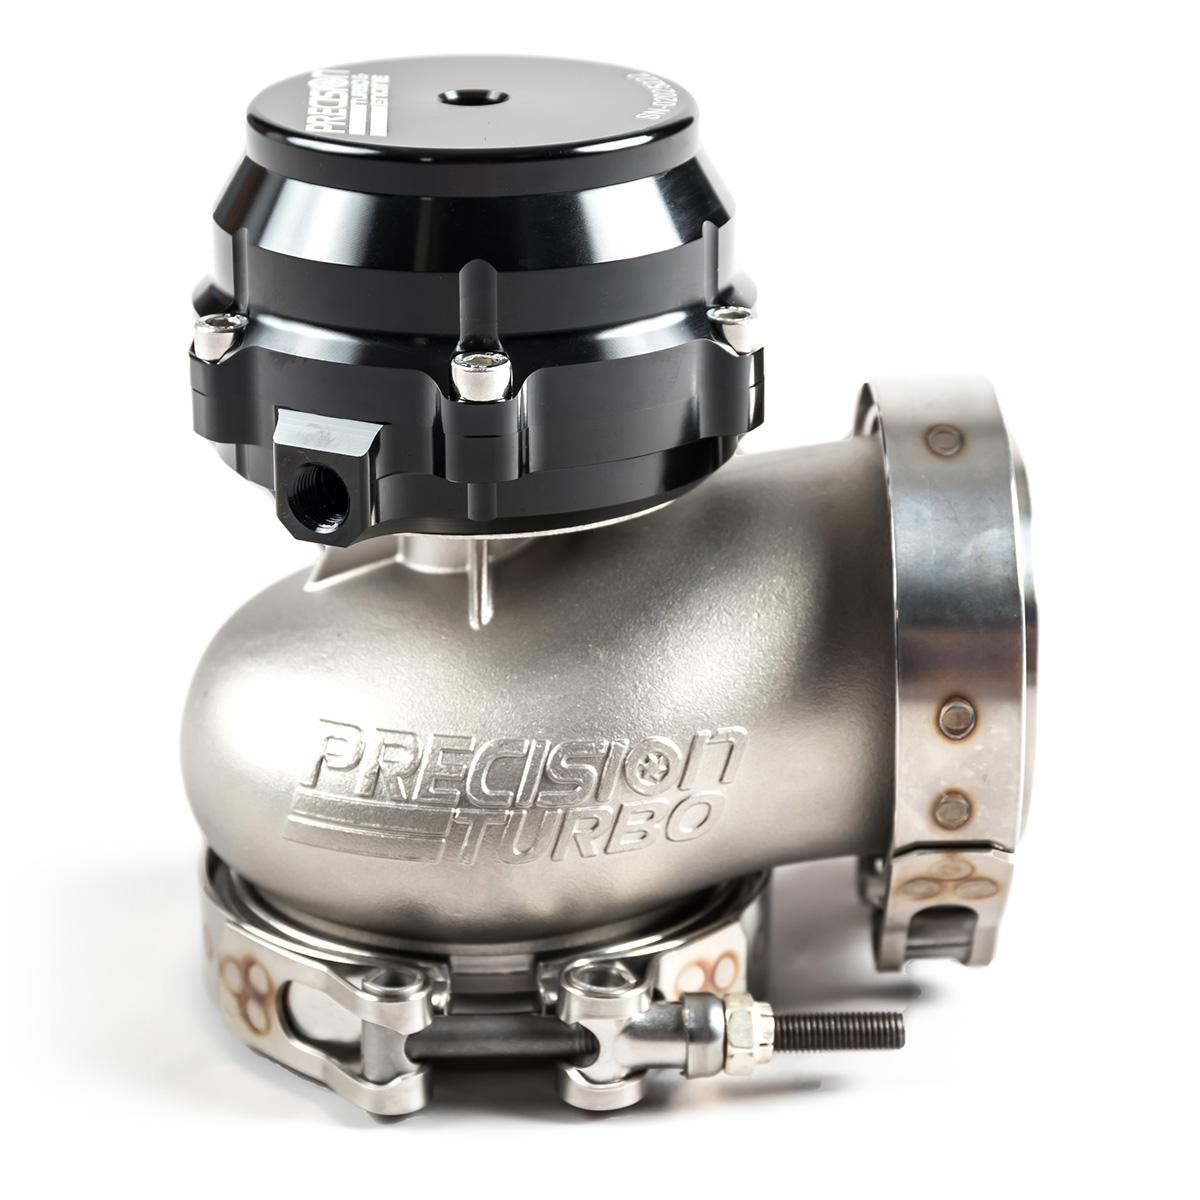 Precision Turbo For Subaru: Precision Turbo PW66 66mm External Wastegate